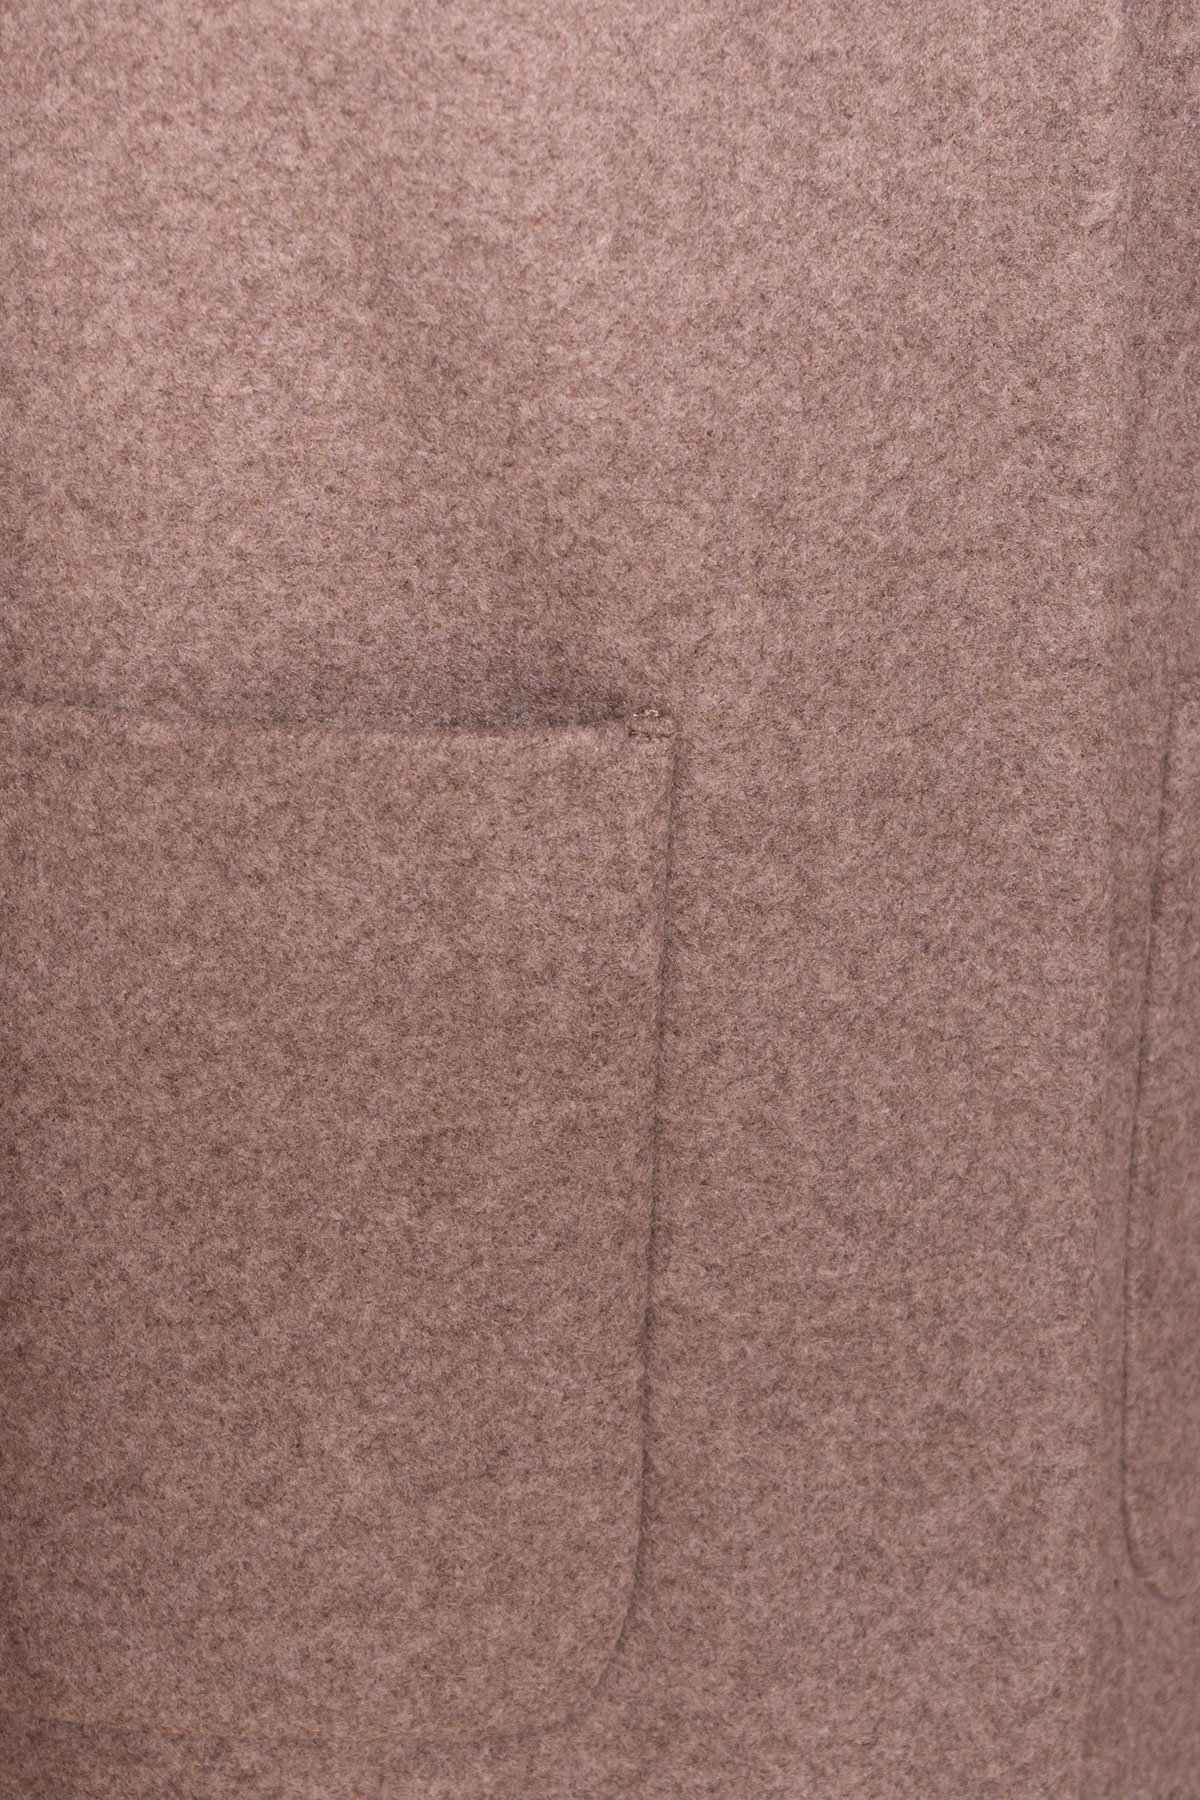 Пальто Ажен лайт 6292 АРТ. 41072 Цвет: Бежевый 28 - фото 5, интернет магазин tm-modus.ru